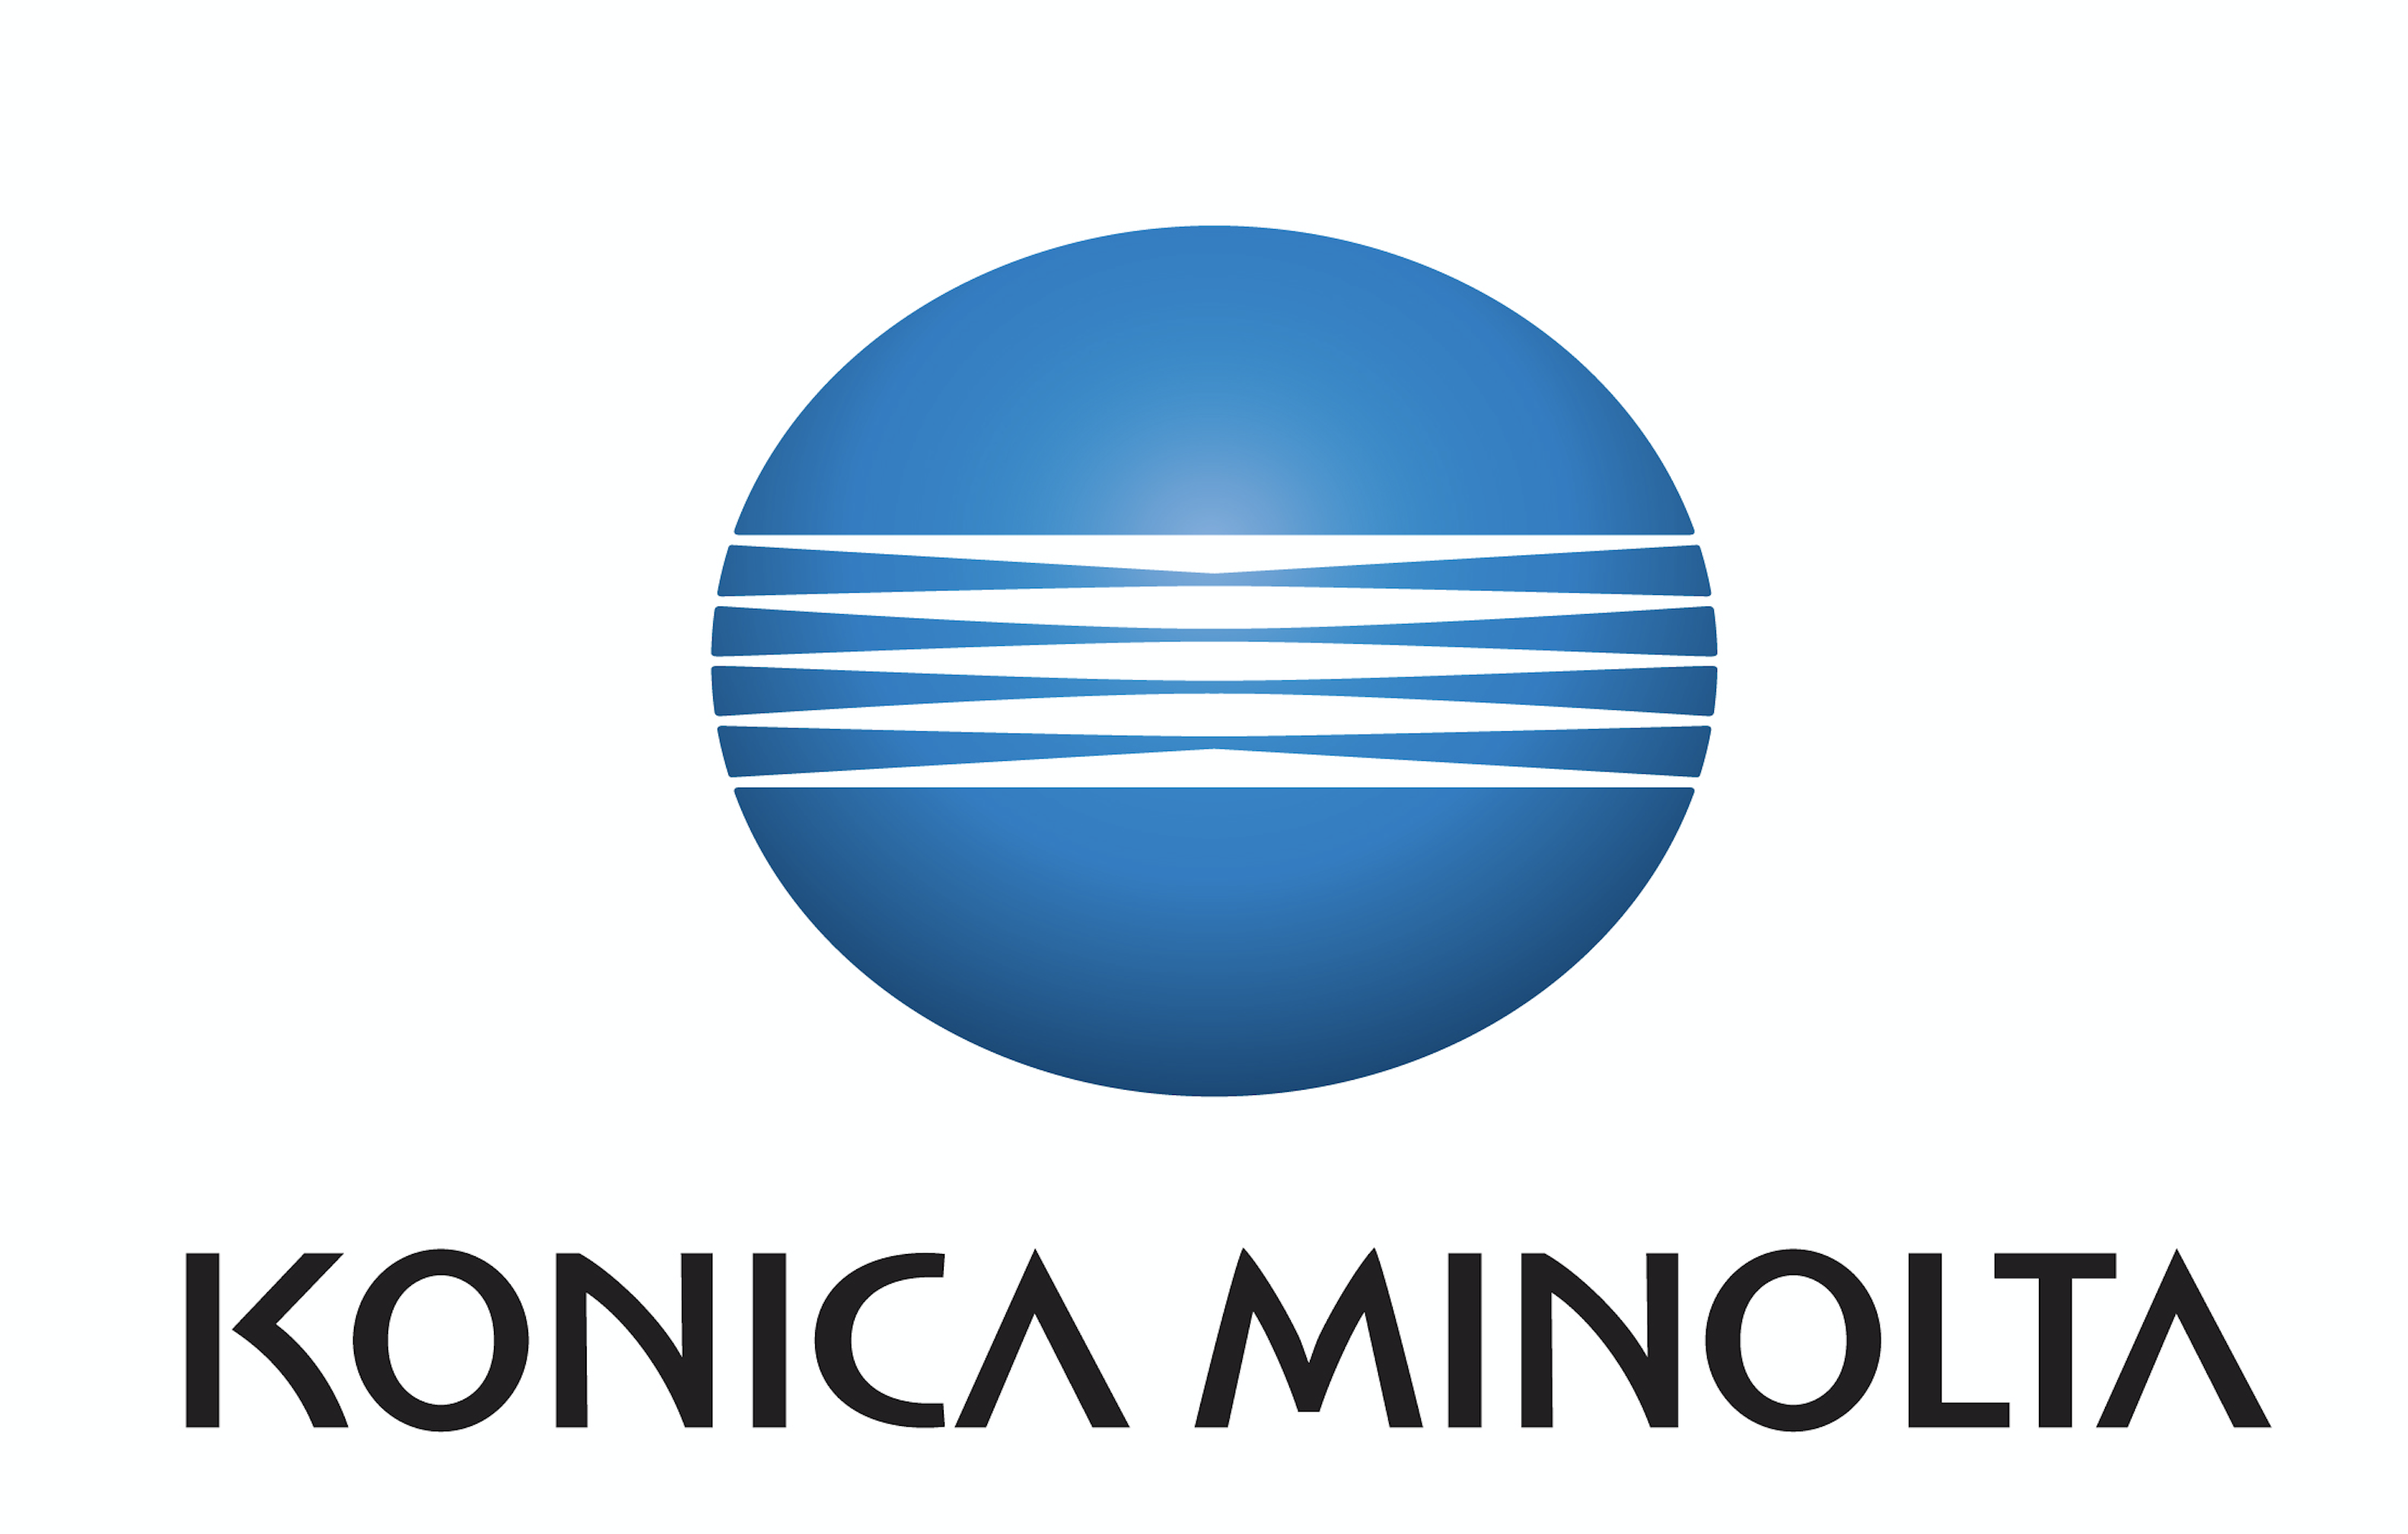 Konica Minolta Business Solutions Australia